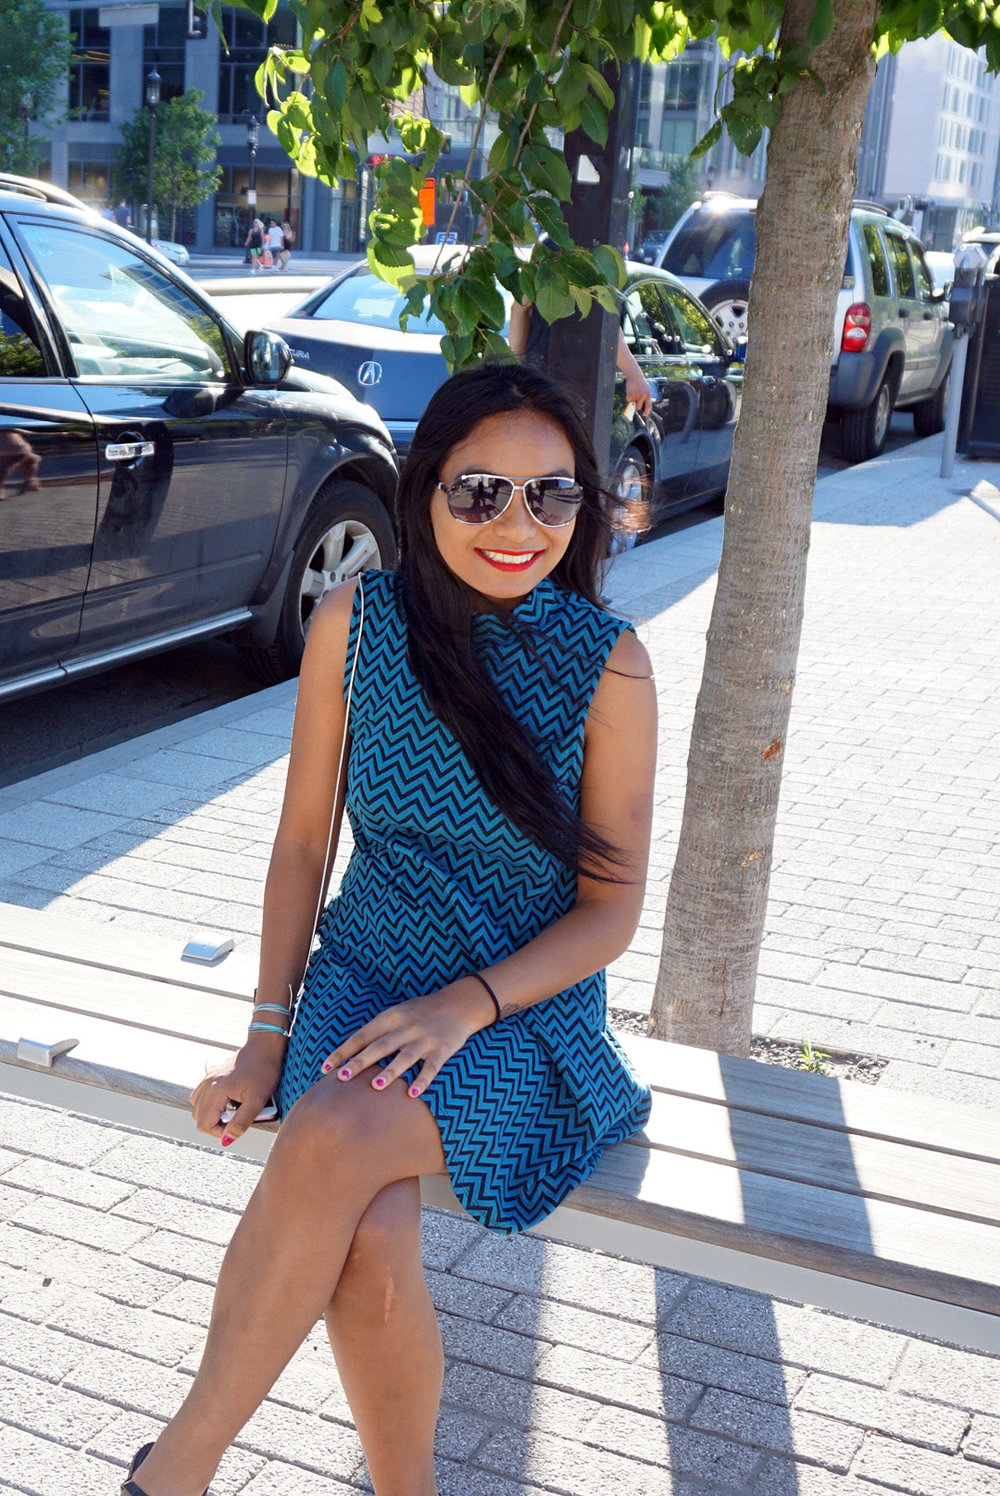 Pura-Vida-Bracelets-Summer-Adventures-Style-Blogger-LINDATENCHITRAN-1-1616x1080.jpg